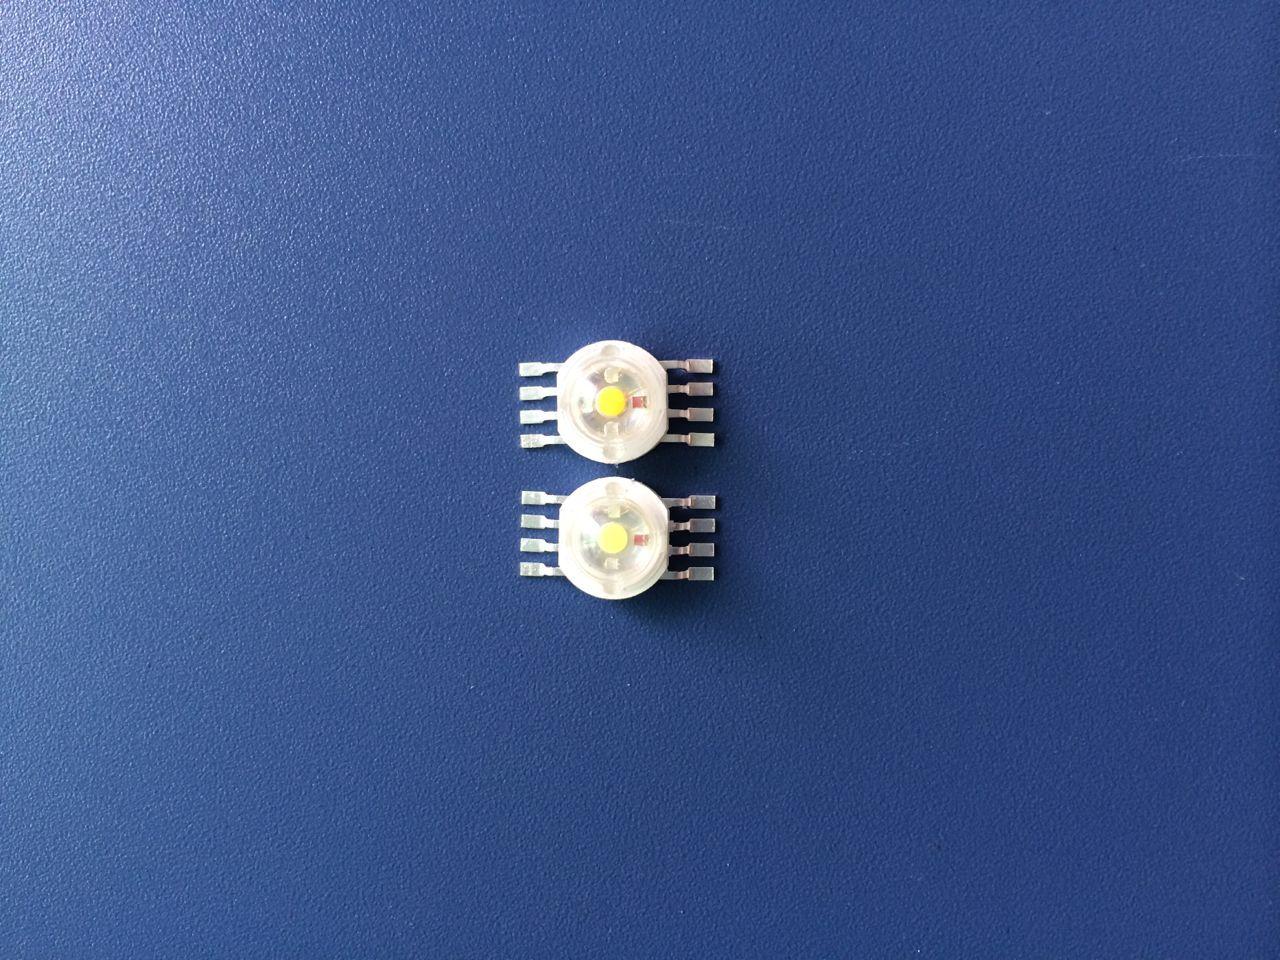 LED大功率灯珠RGBW红绿蓝白暖白8脚灯珠4W8W